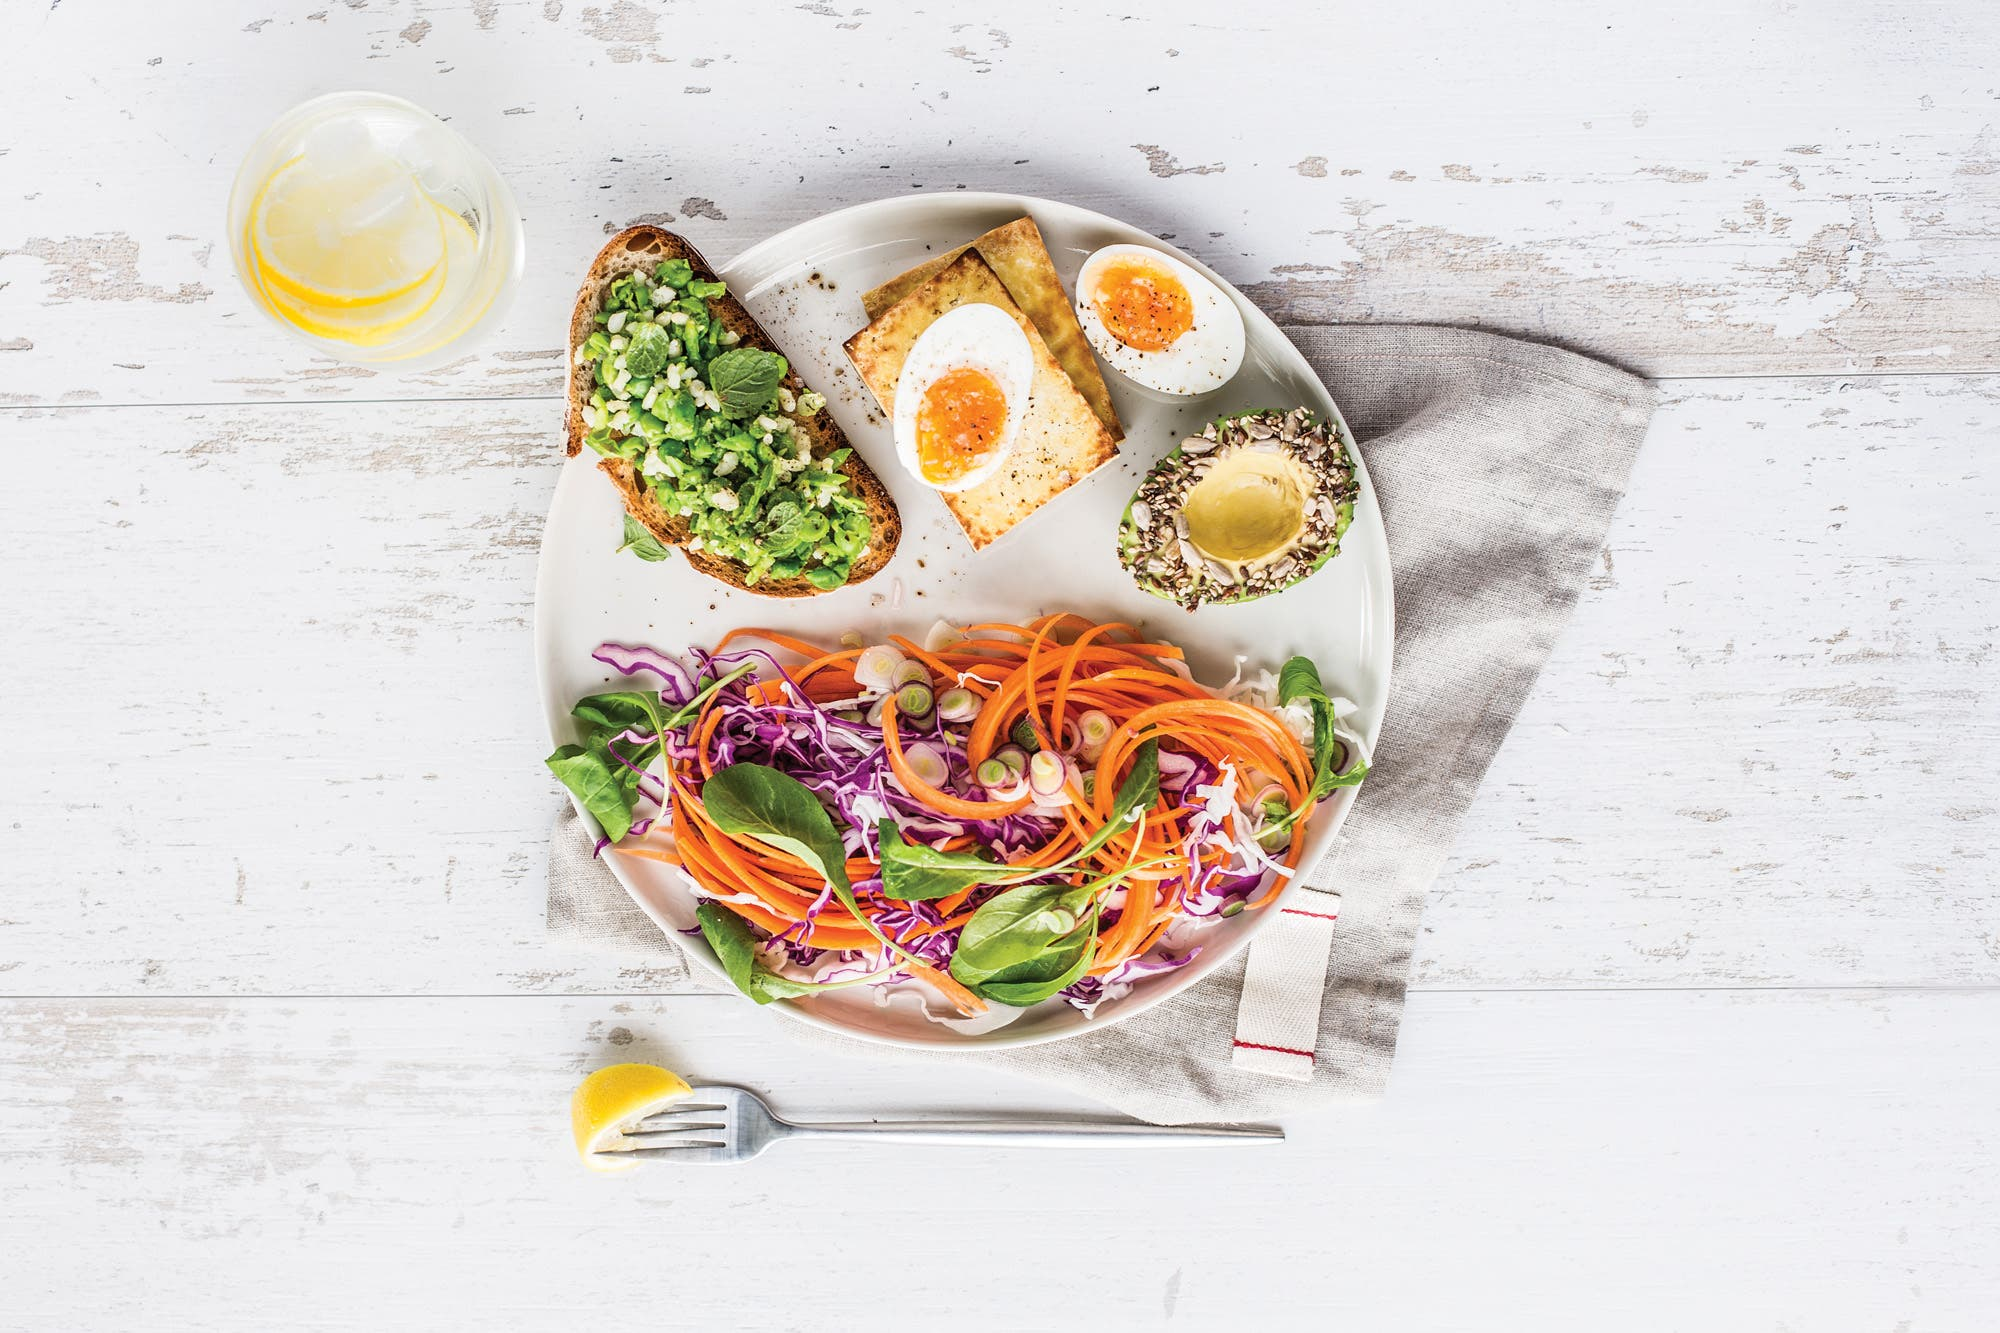 dieta huevo duro clinica mayor